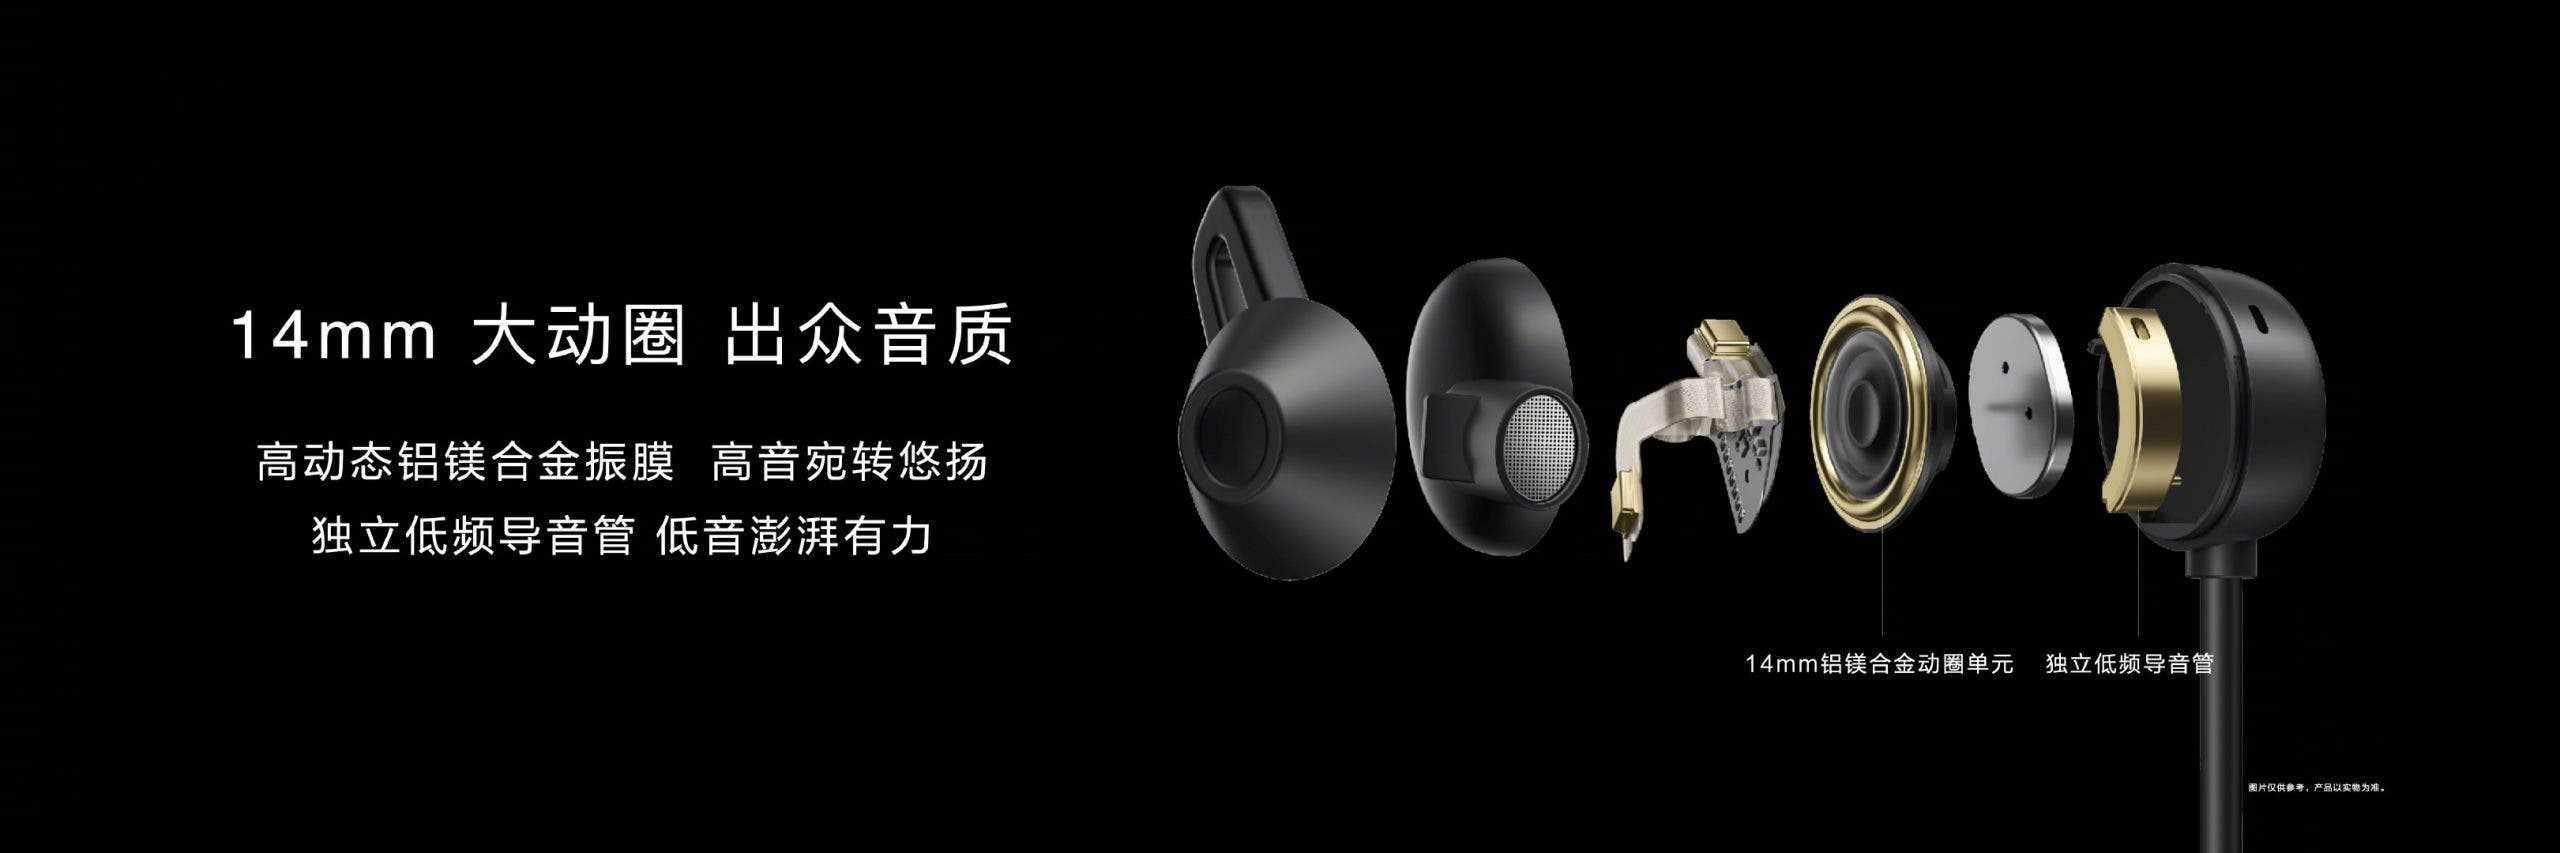 FreeLace Pro neck-wearing noise-cancelling headphones